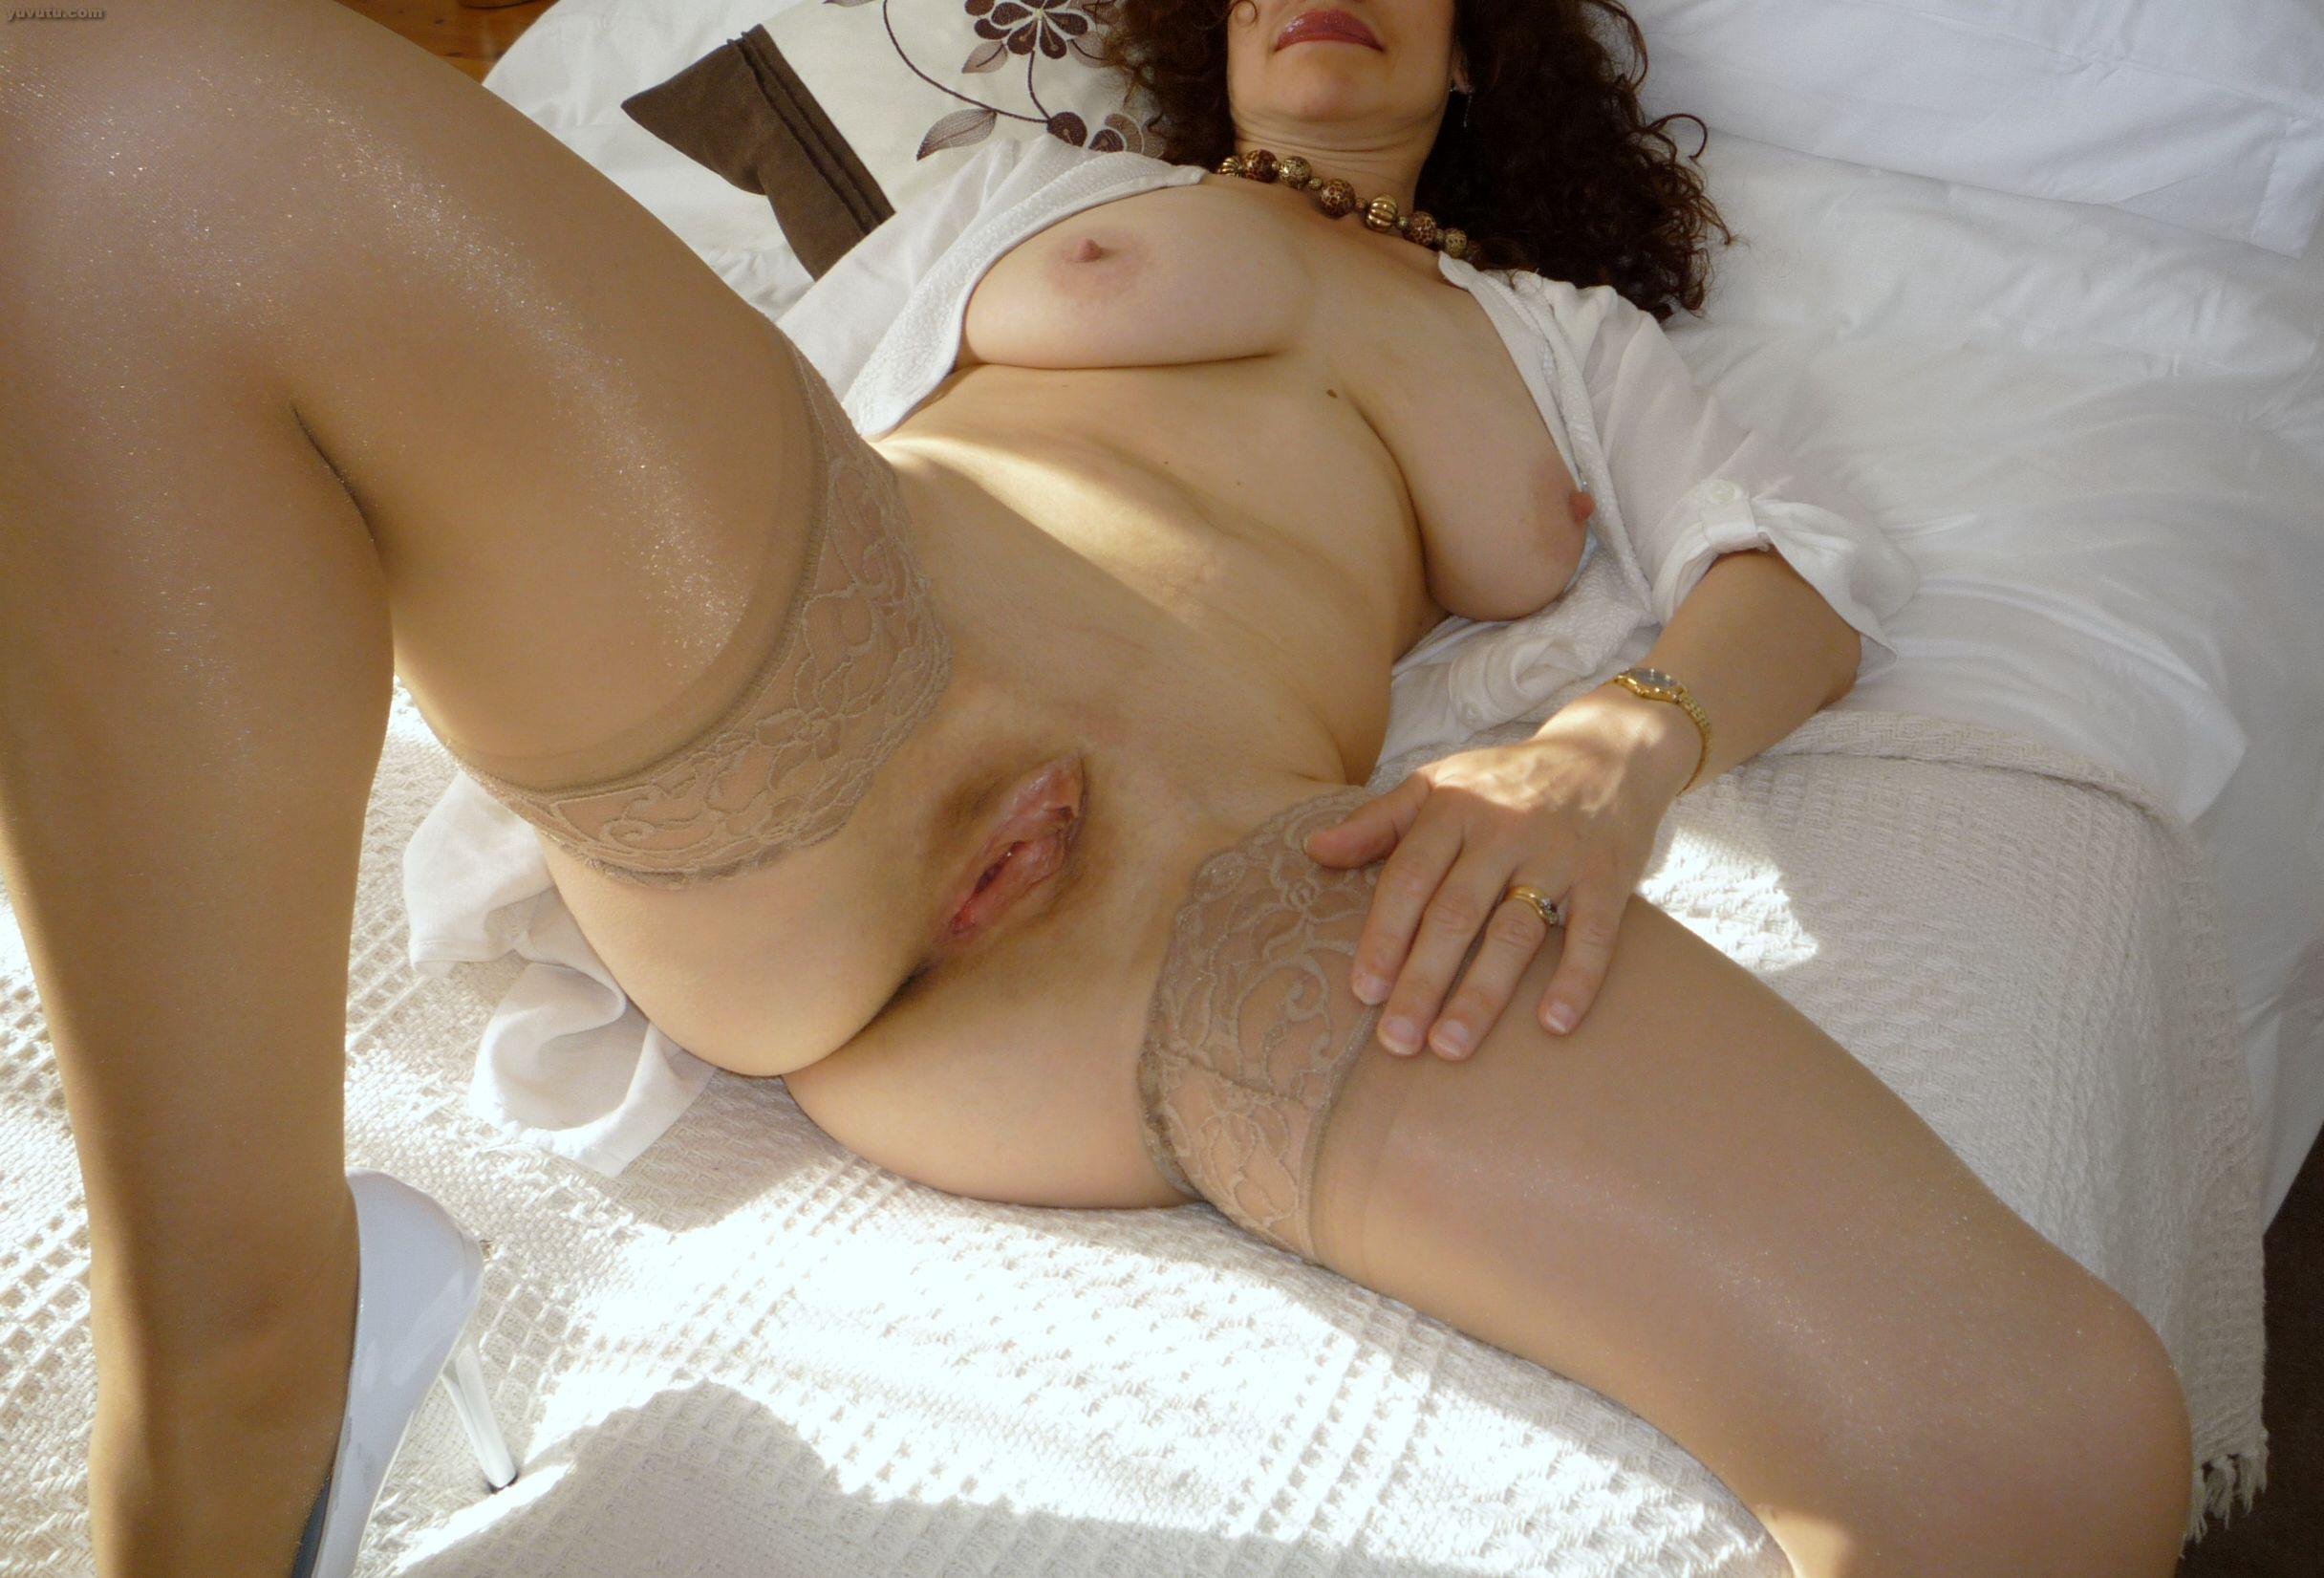 Femjoy nude beach babes